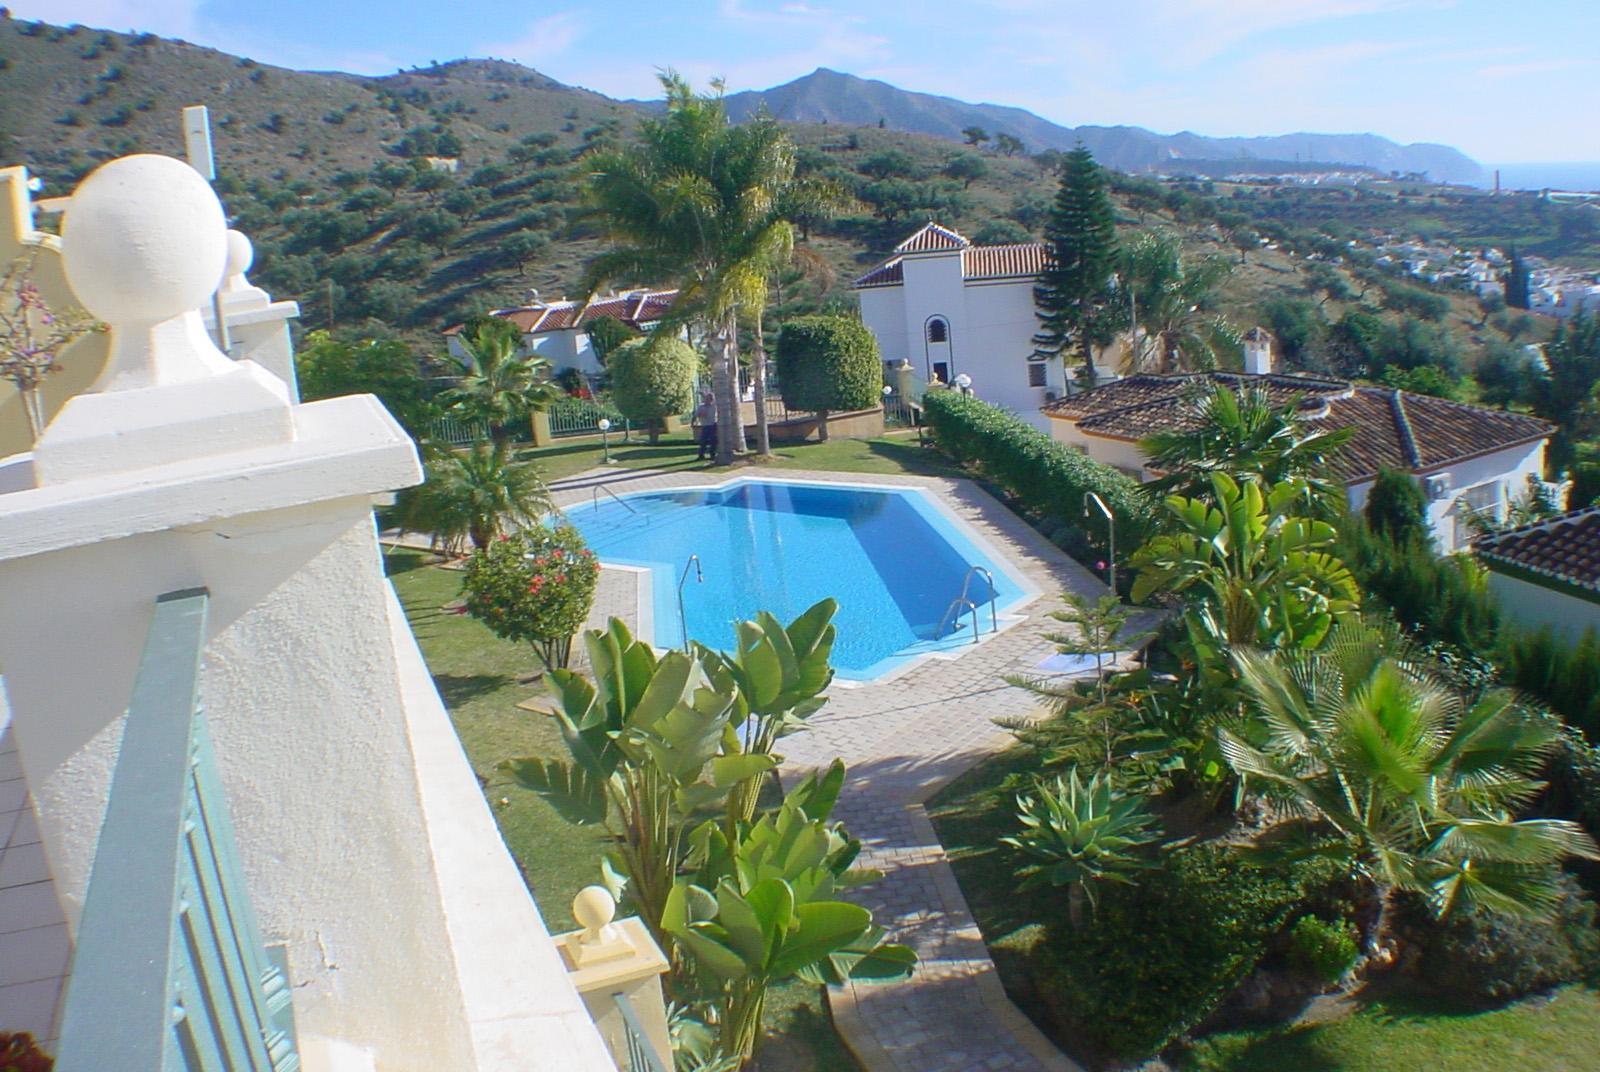 Swimming Pool Project Management : Edificio bellavista eurosur project manager